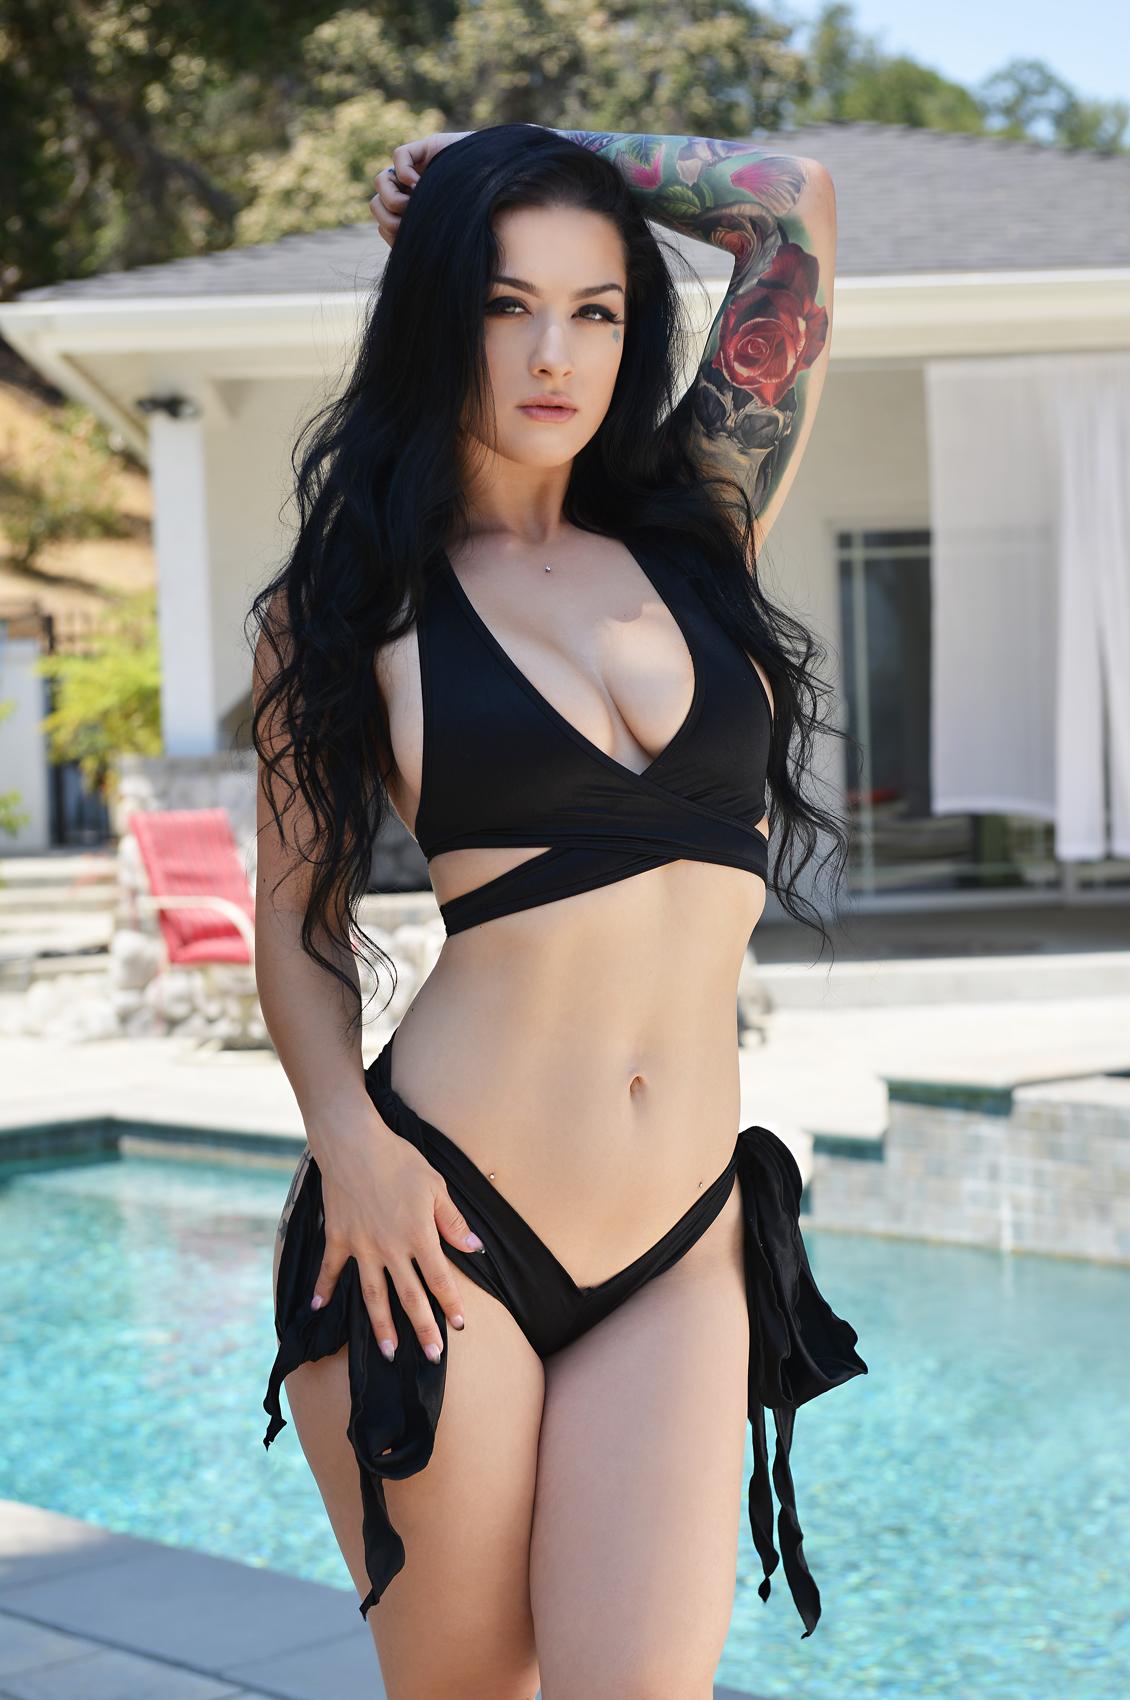 Katrina Jade's VR Porn Videos, Bio & Free Nude Pics